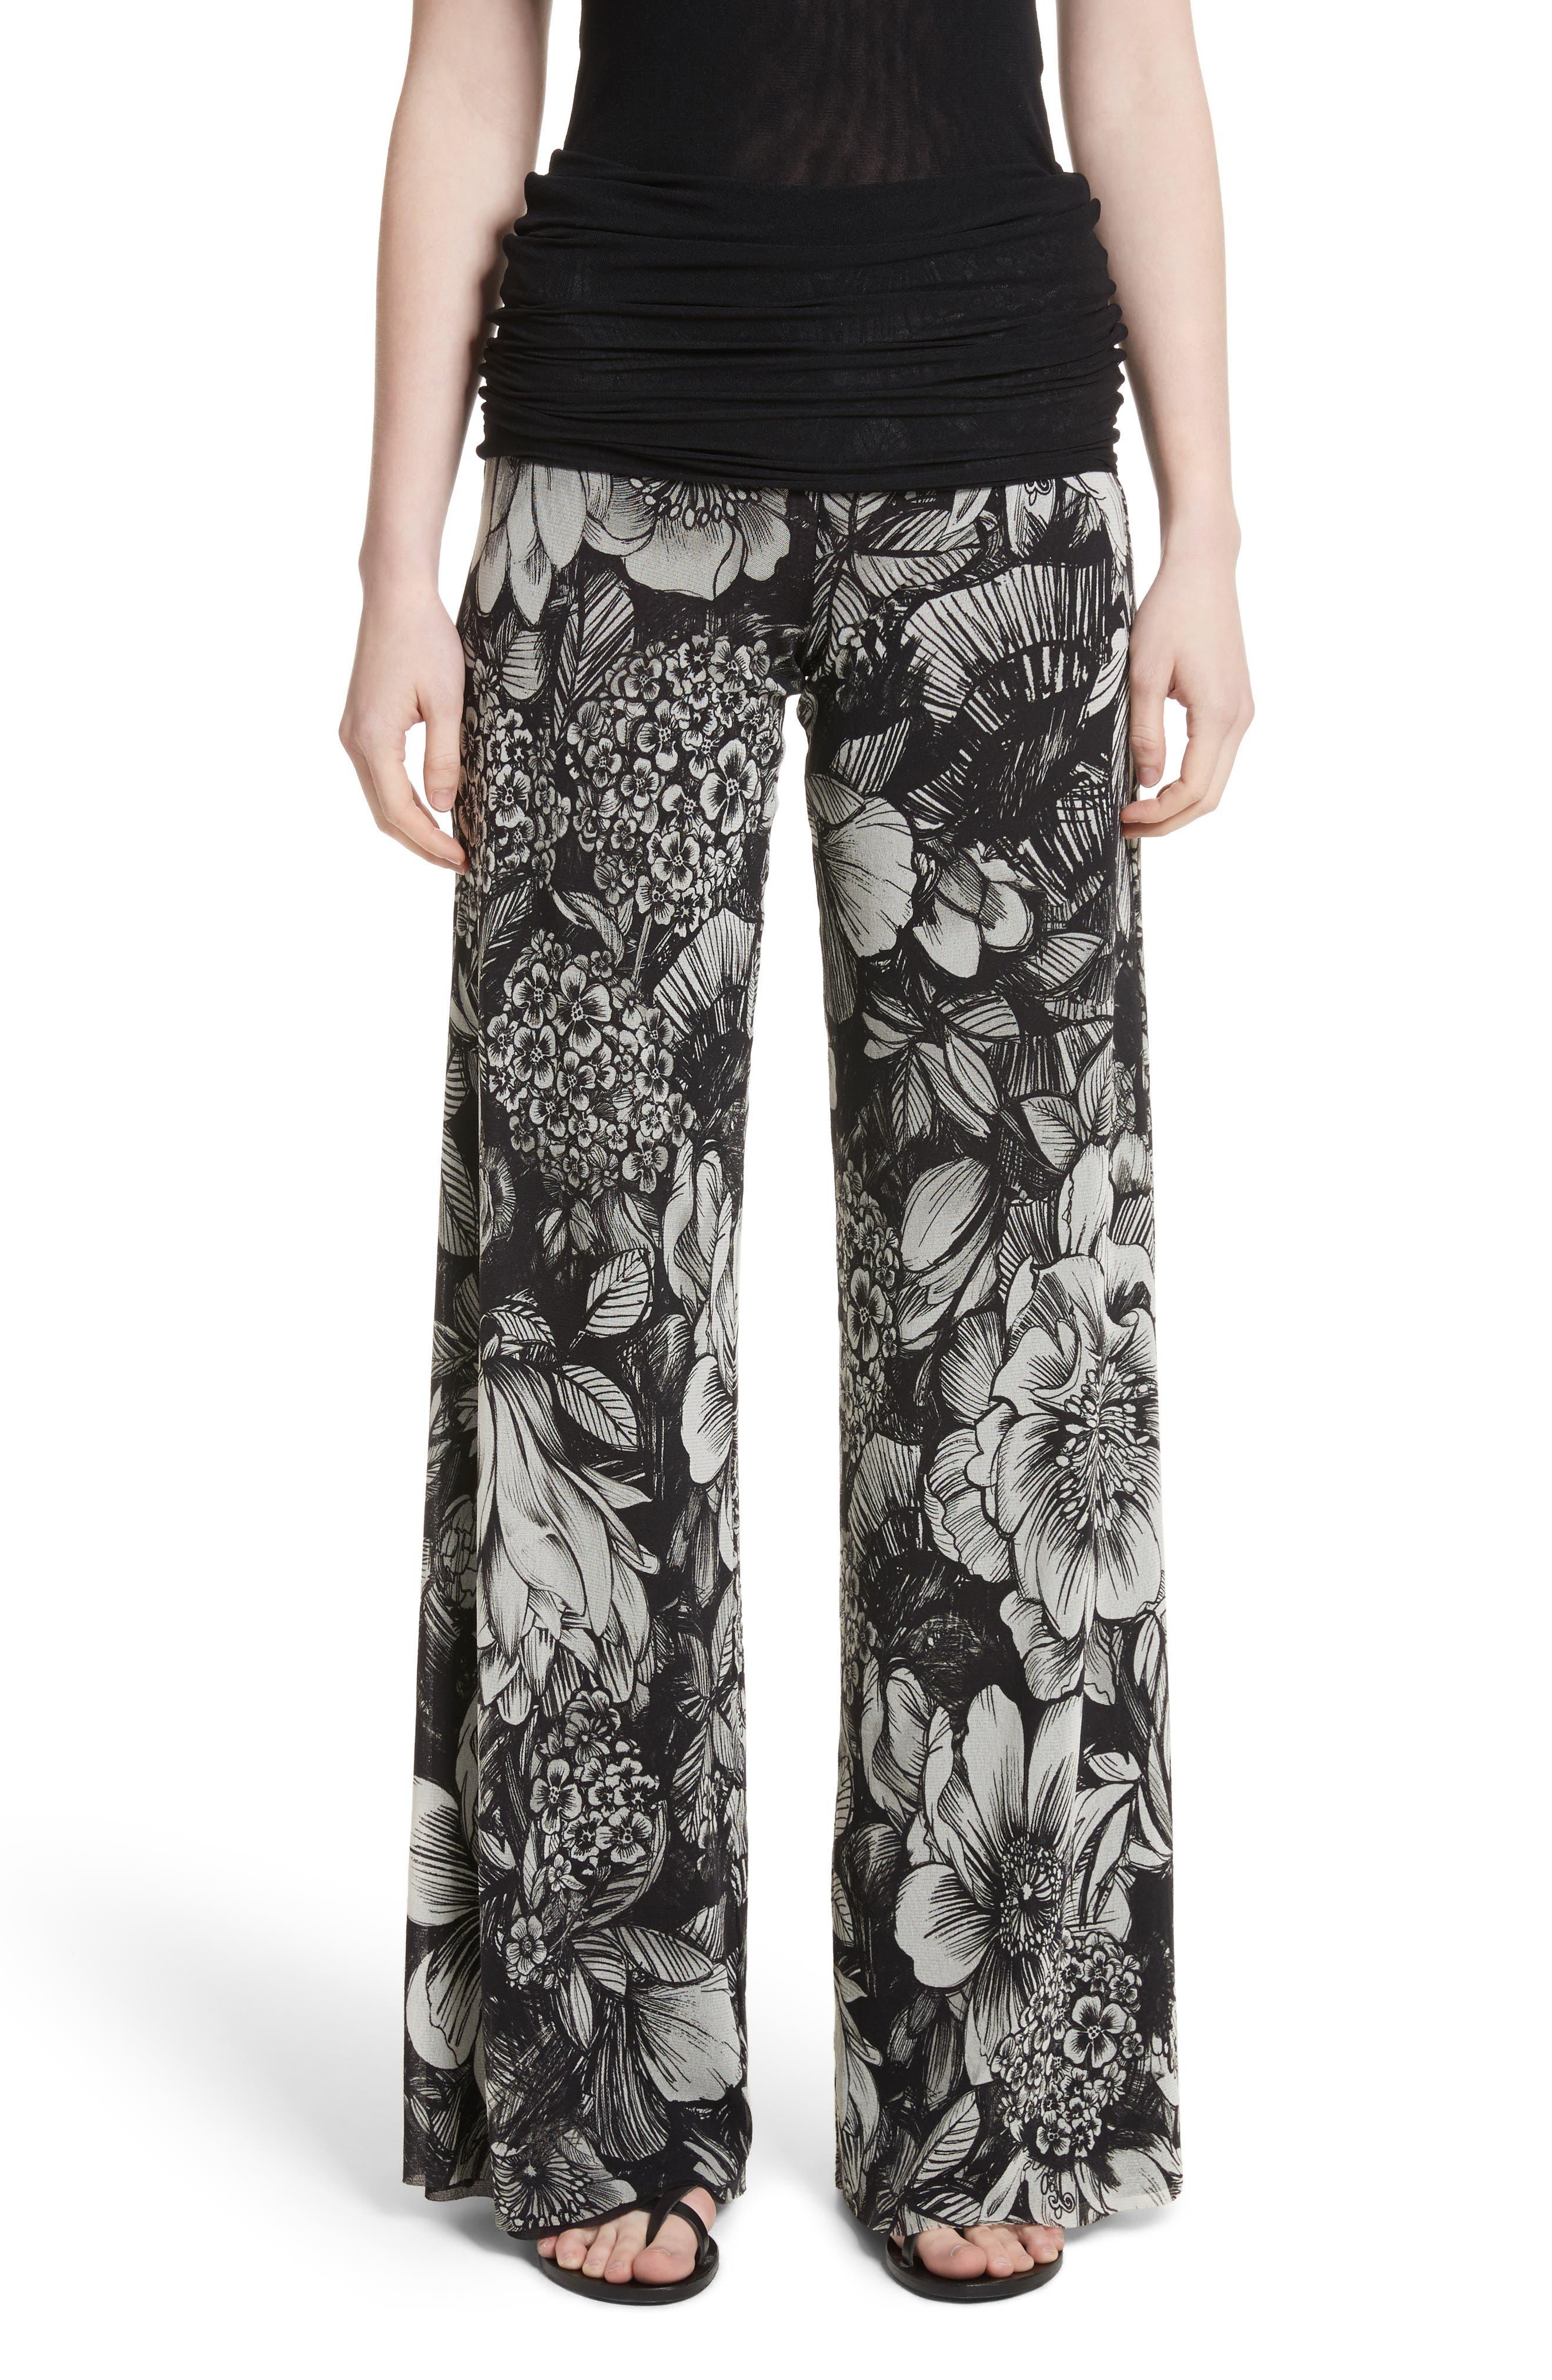 Alternate Image 1 Selected - Fuzzi Print Tulle Wide Leg Pants